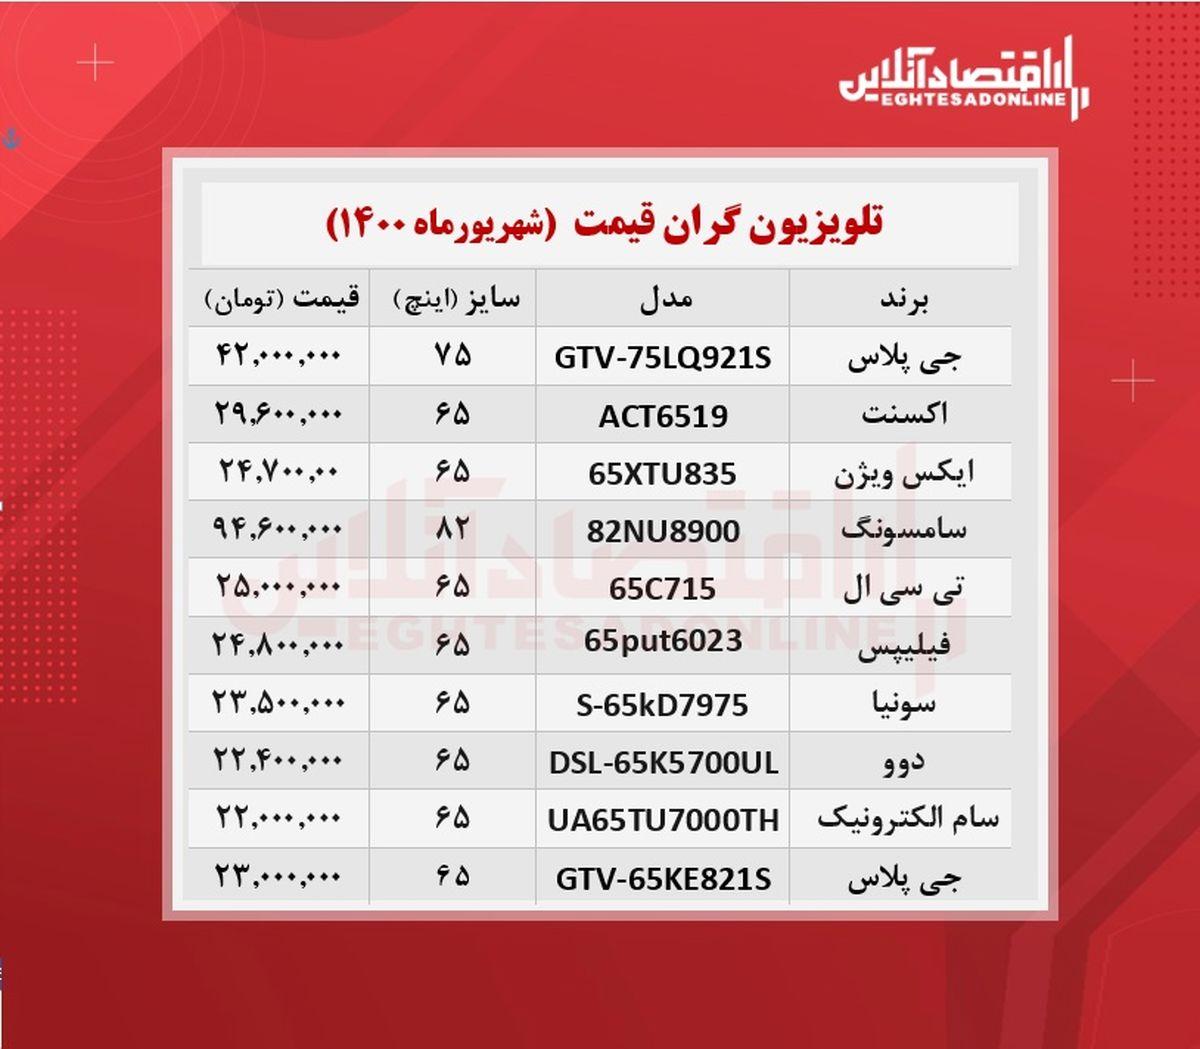 قیمت ۱۰تلویزیون گران بازار تهران + جدول